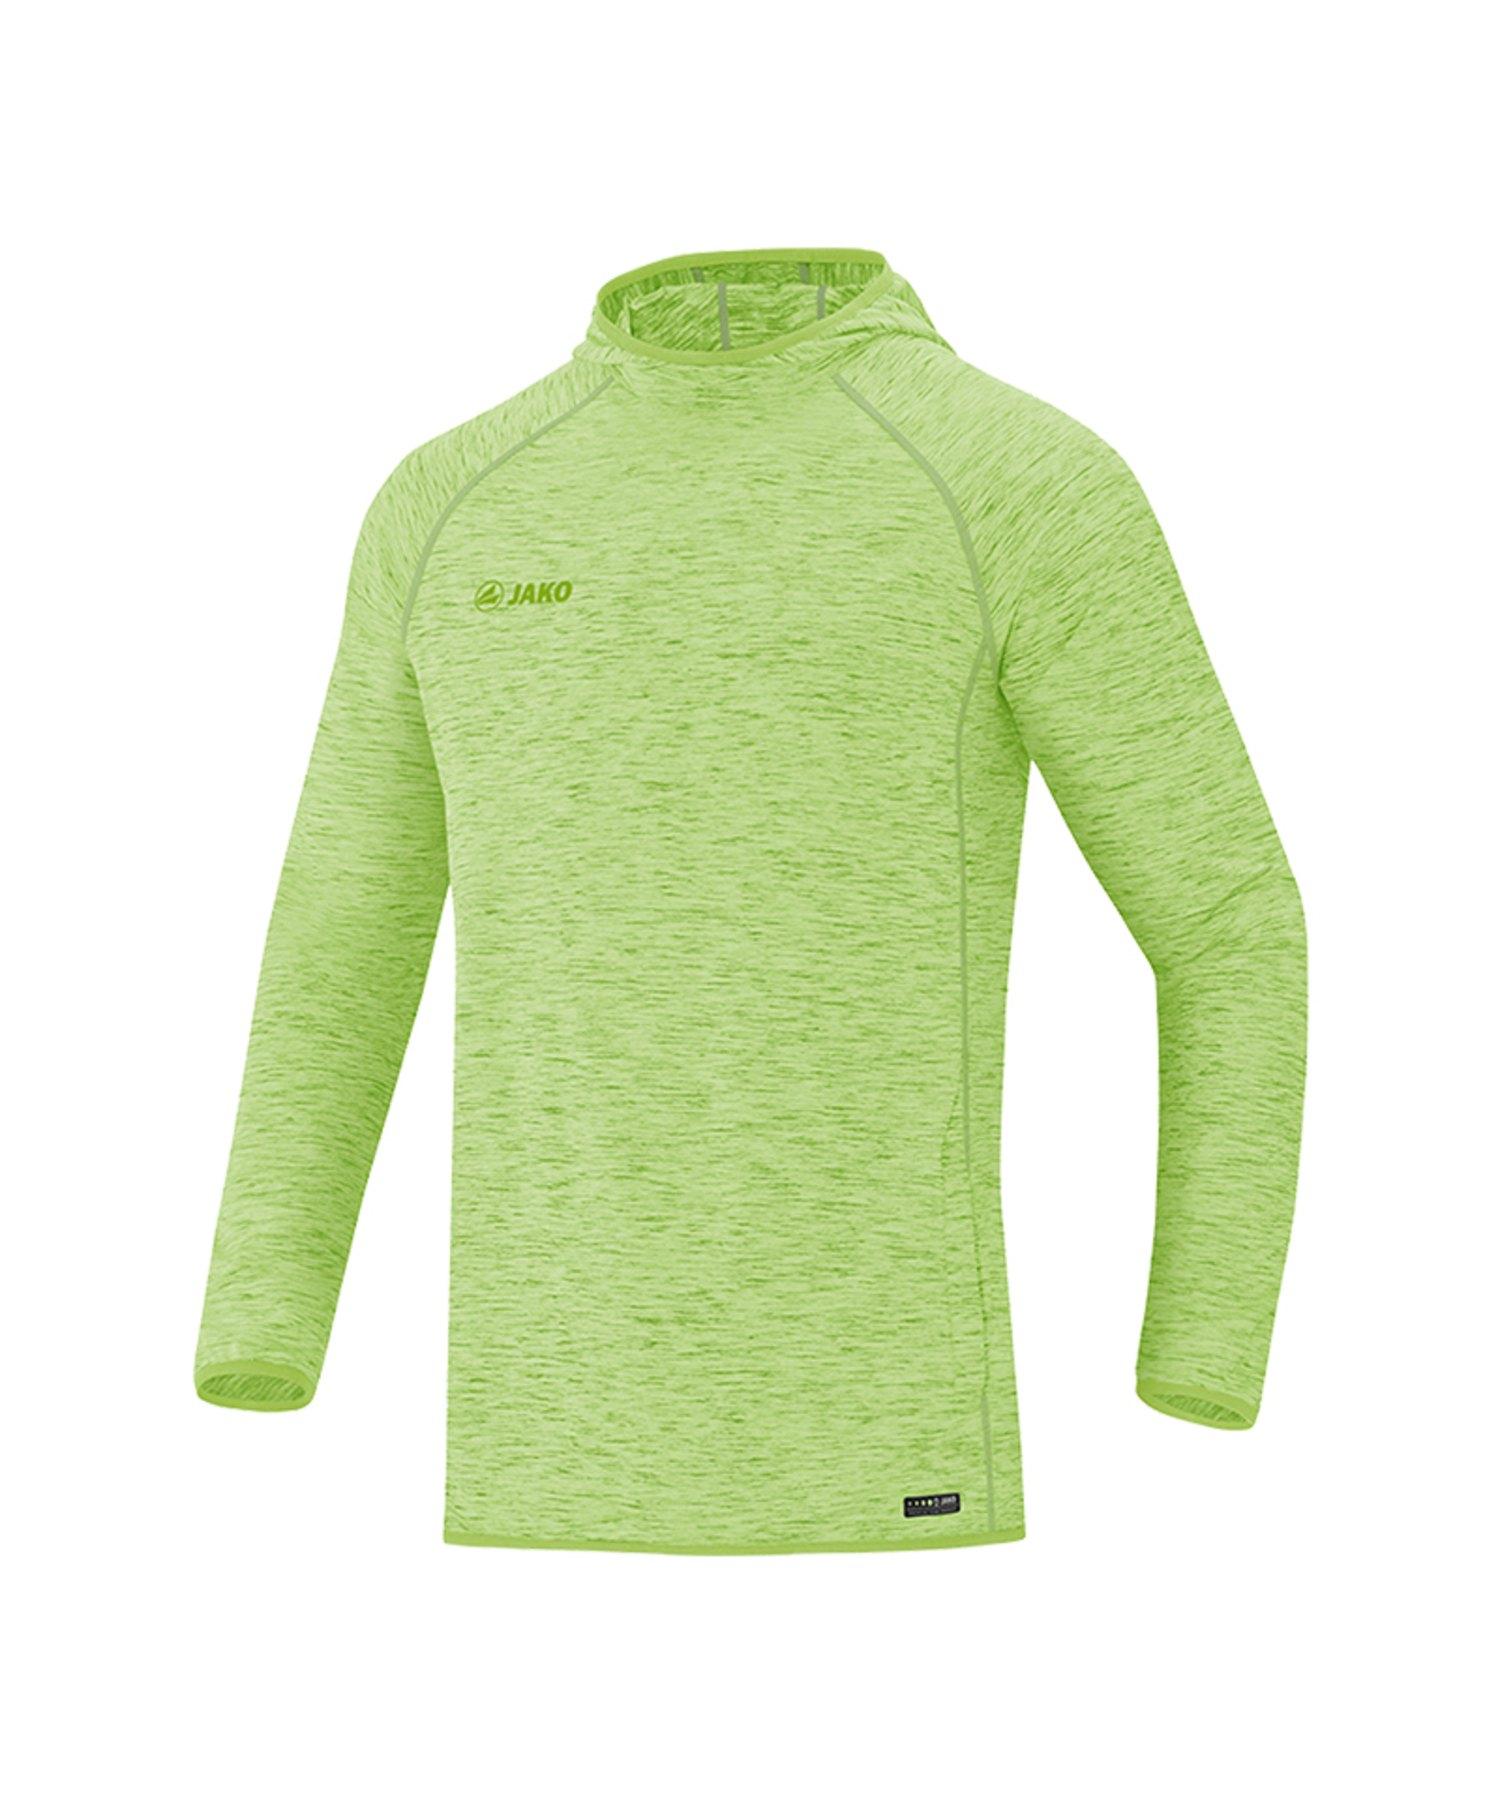 Jako Active Kapuzensweatshirt Grün F25 - Gruen